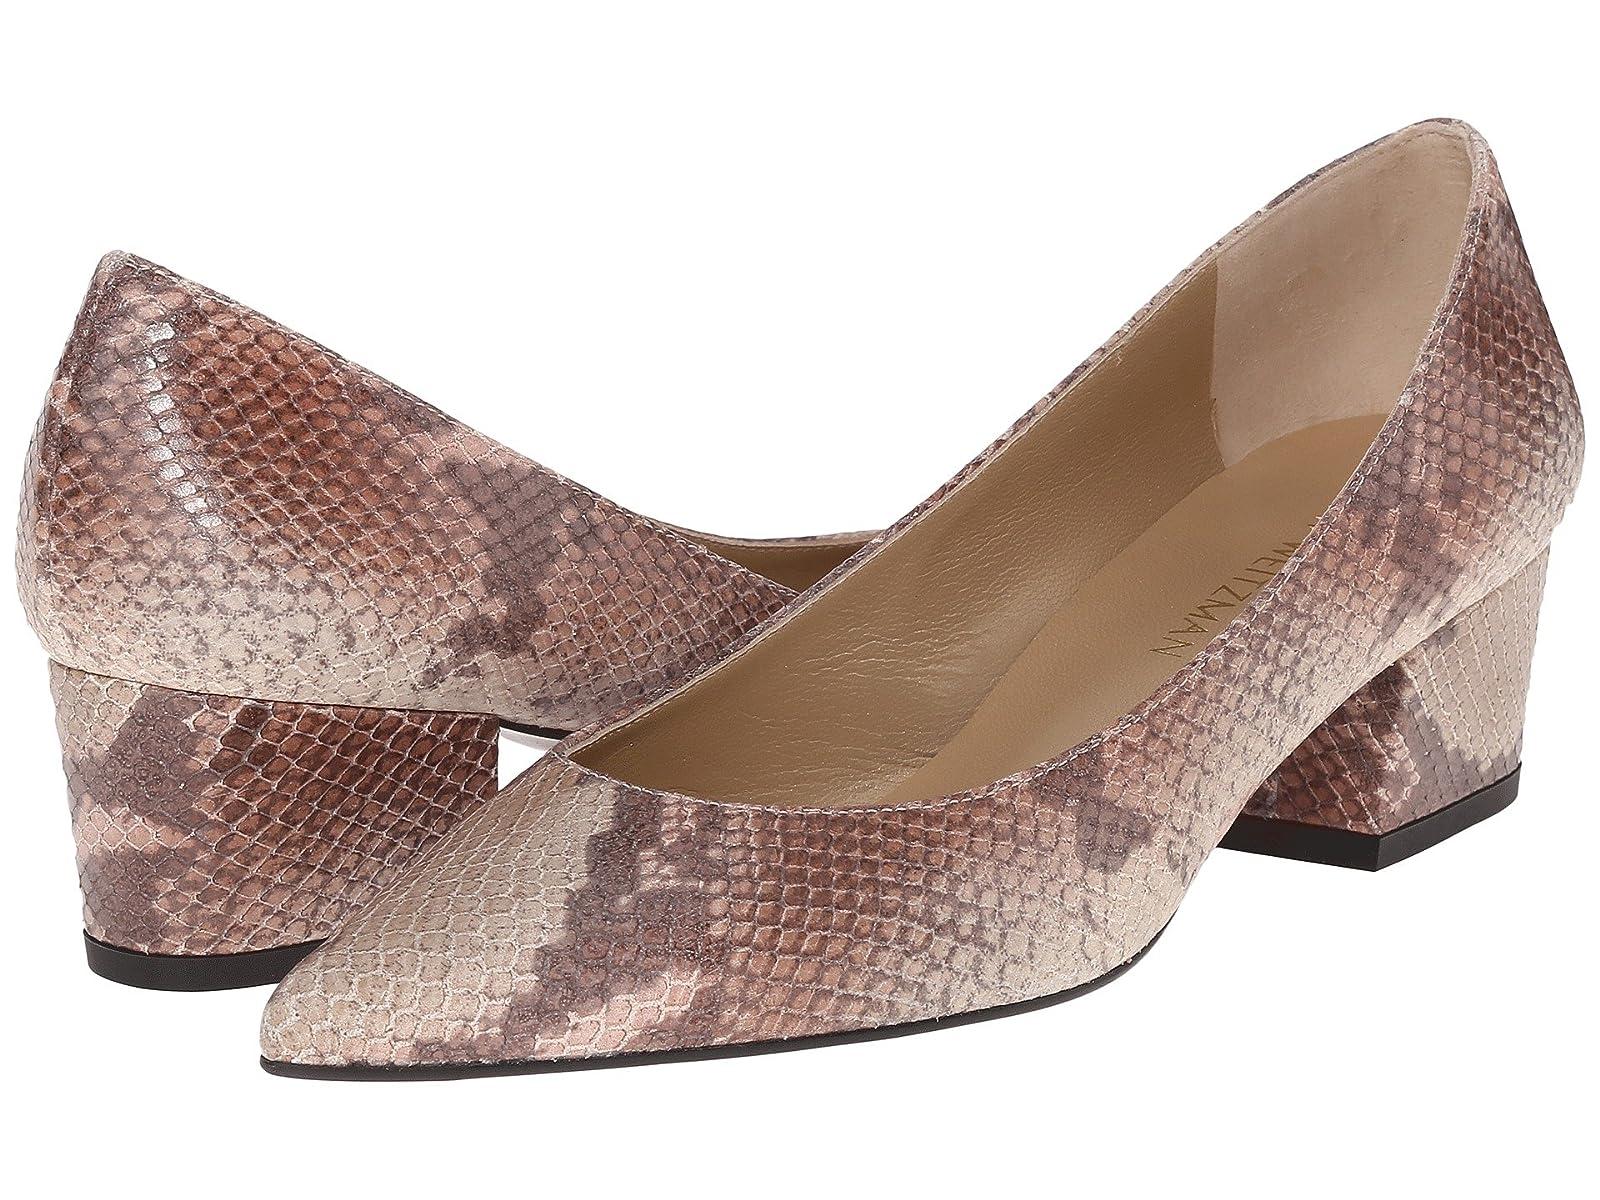 Stuart Weitzman LargoCheap and distinctive eye-catching shoes